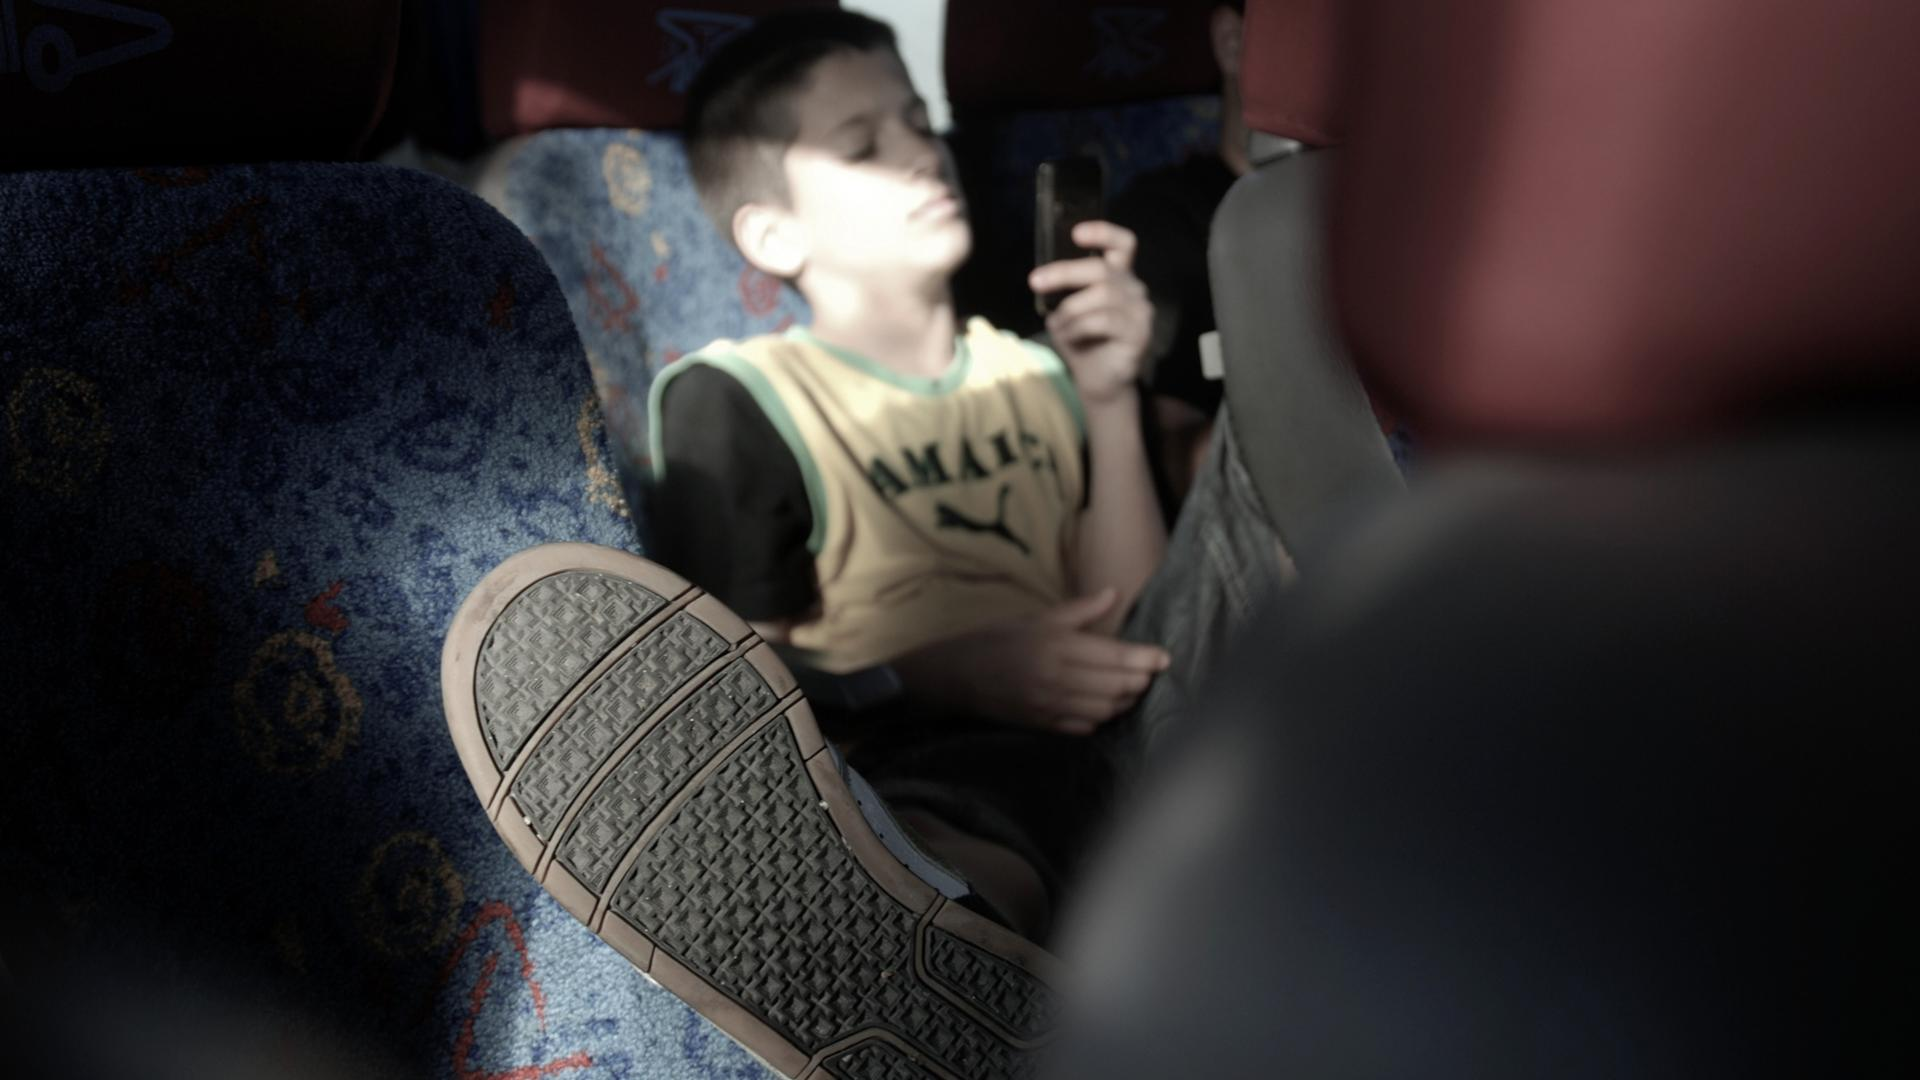 Bus stuff